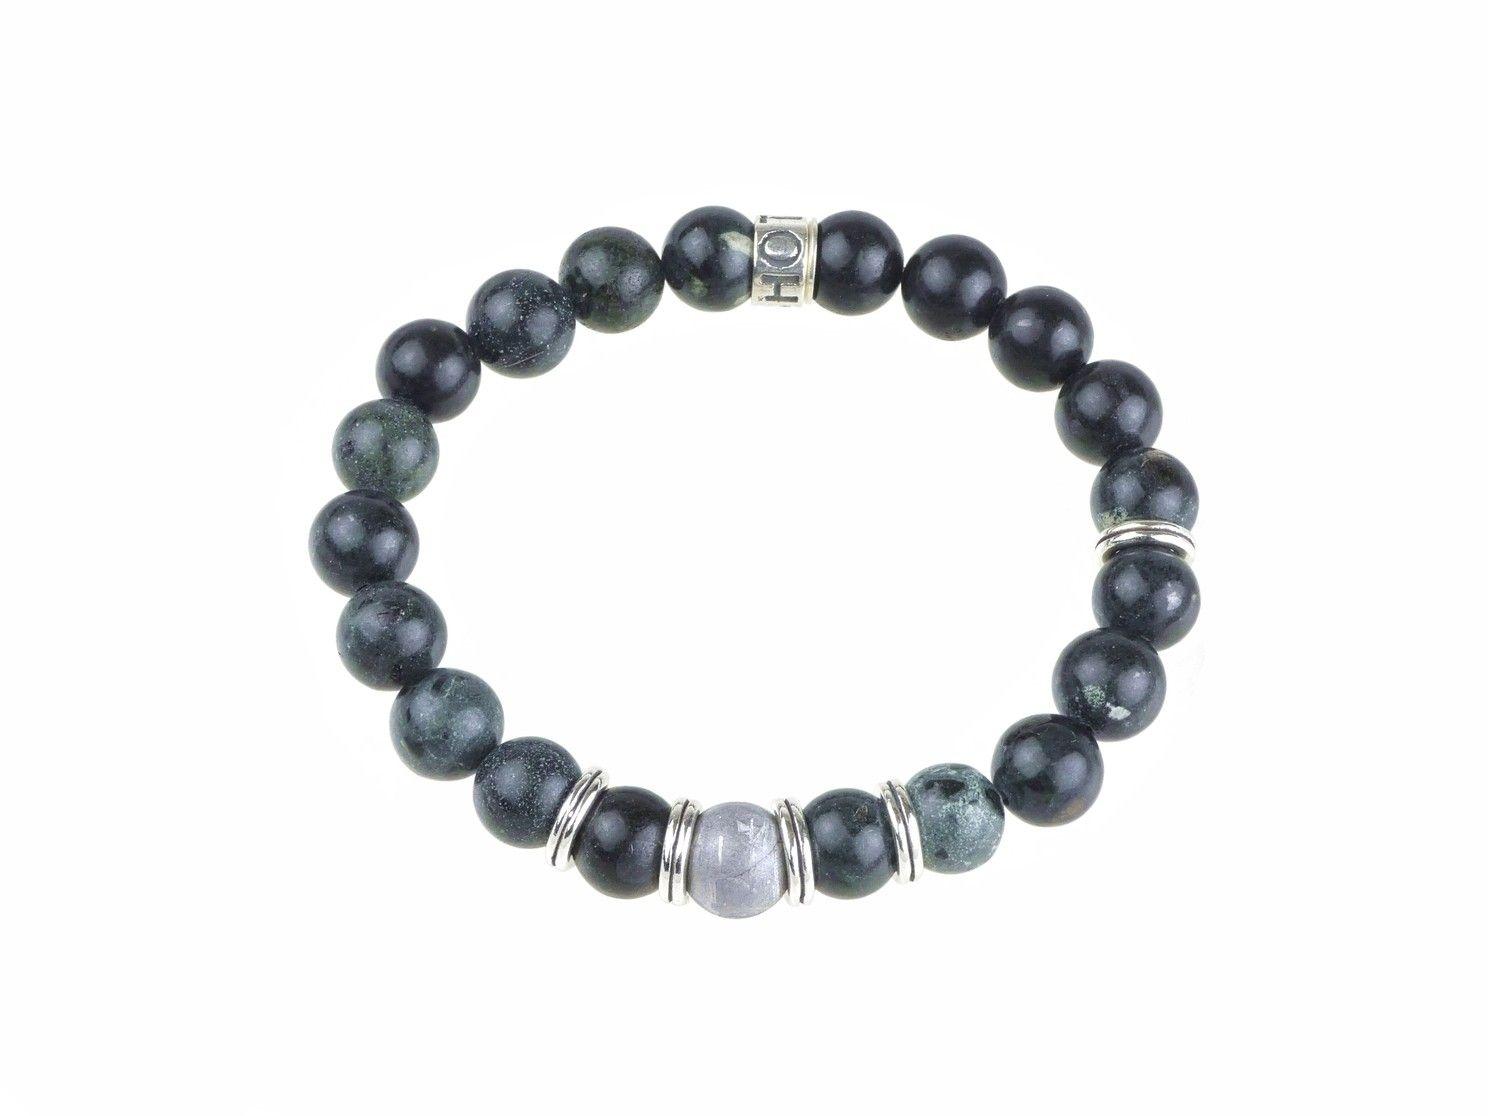 SHOTO STERLING - Sterling Armband - Gibeon Meteorit, Kimberlit, Silber